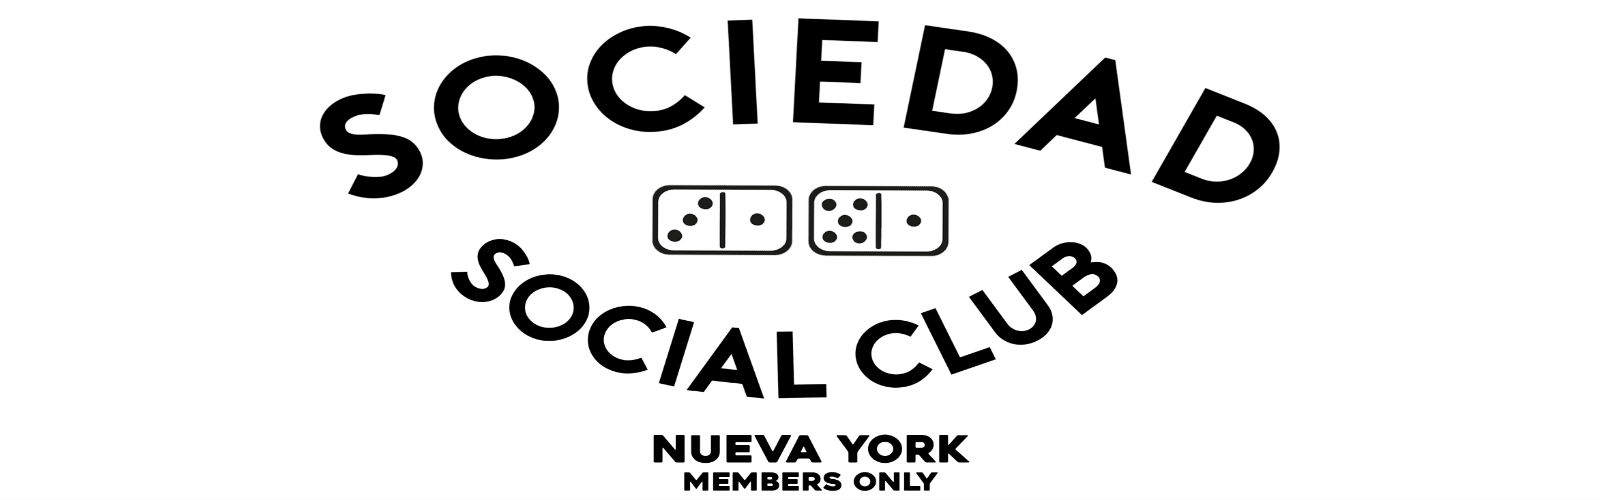 UPTOWN BOUNCE x Sociedad